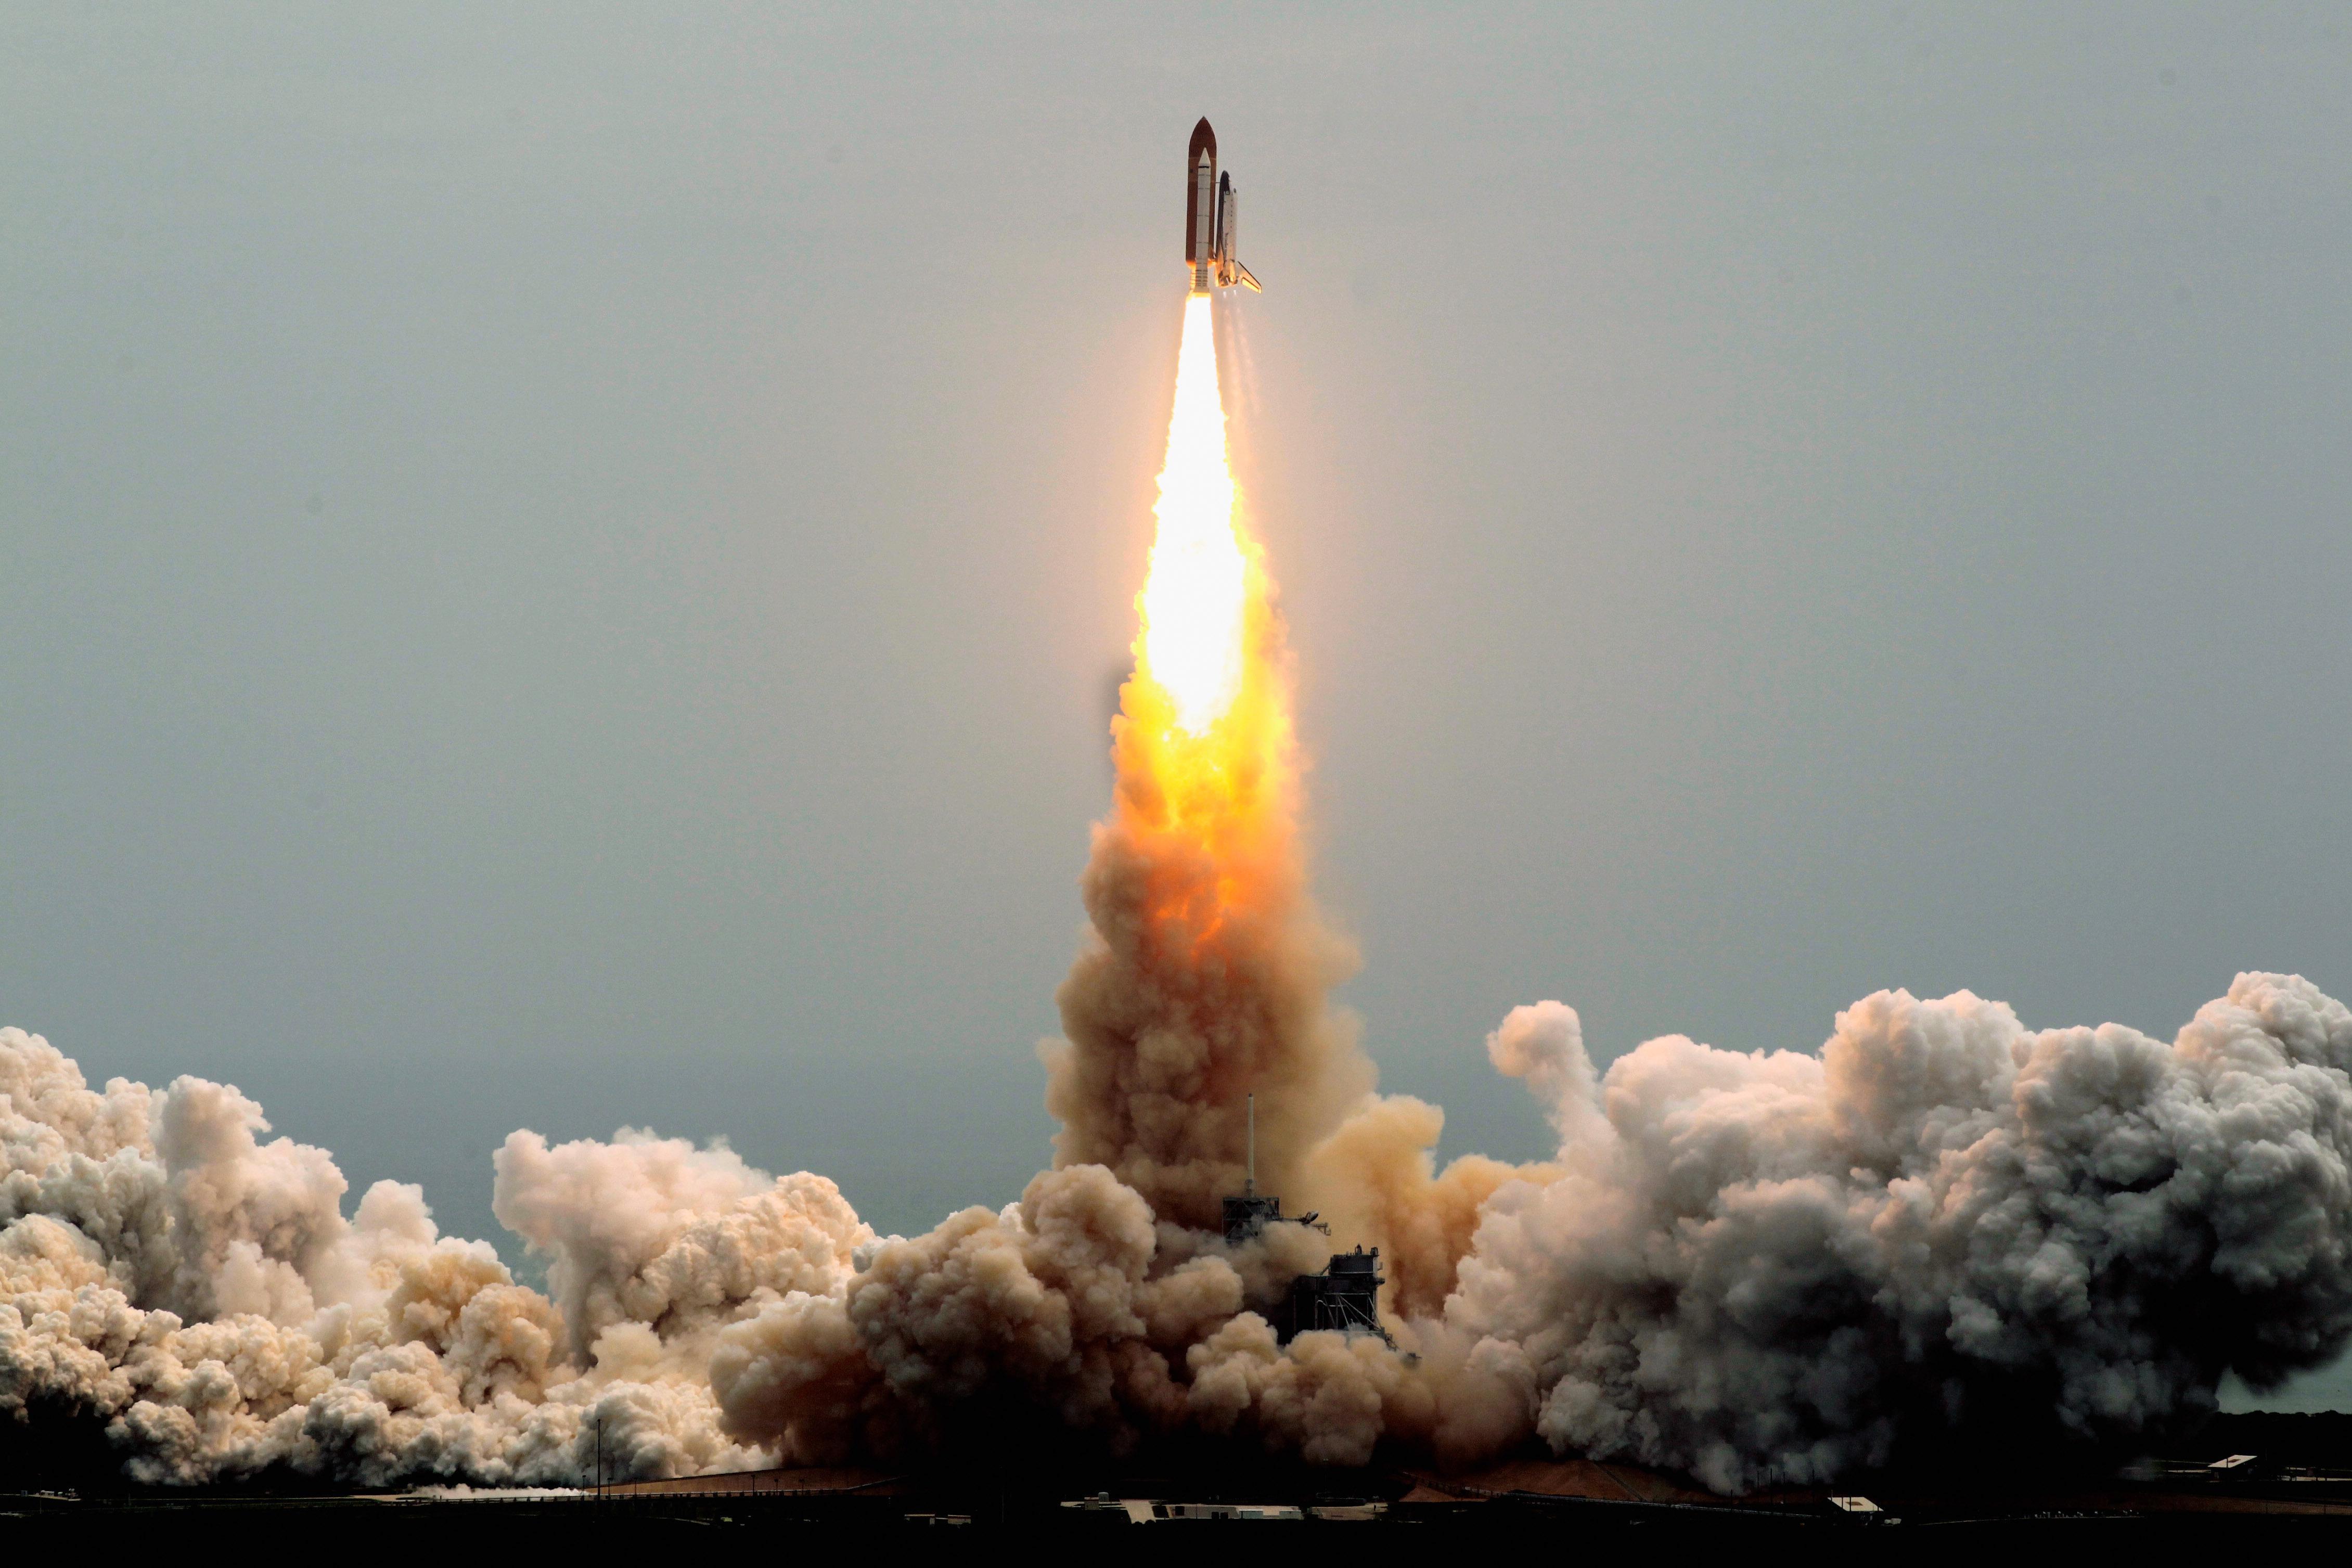 future rocket taking off - HD1650×1070